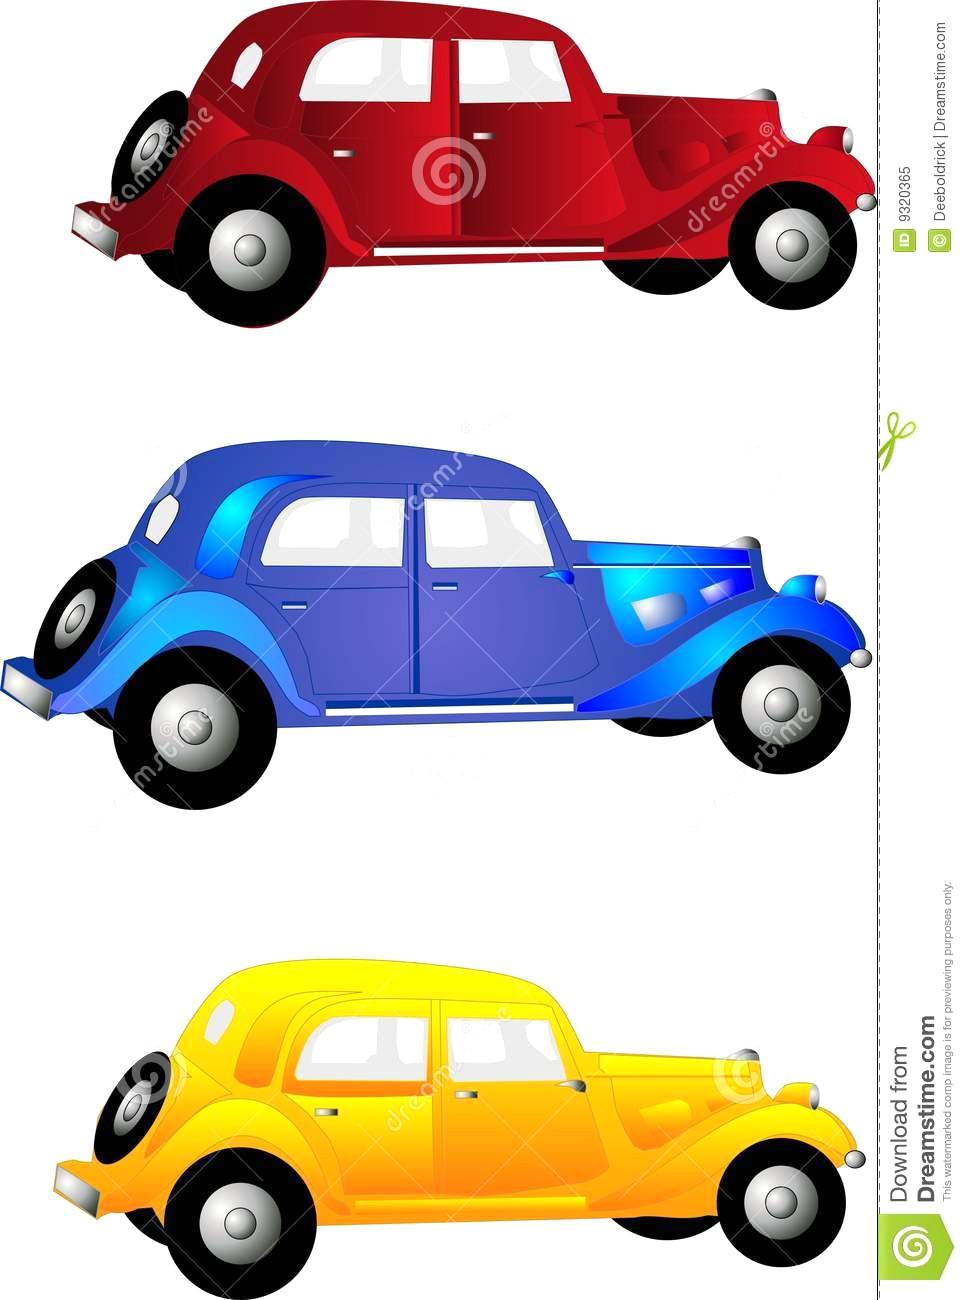 967x1300 Mcqueen Cars Movie Cartoon Transparent Png Clip Art Image Disney